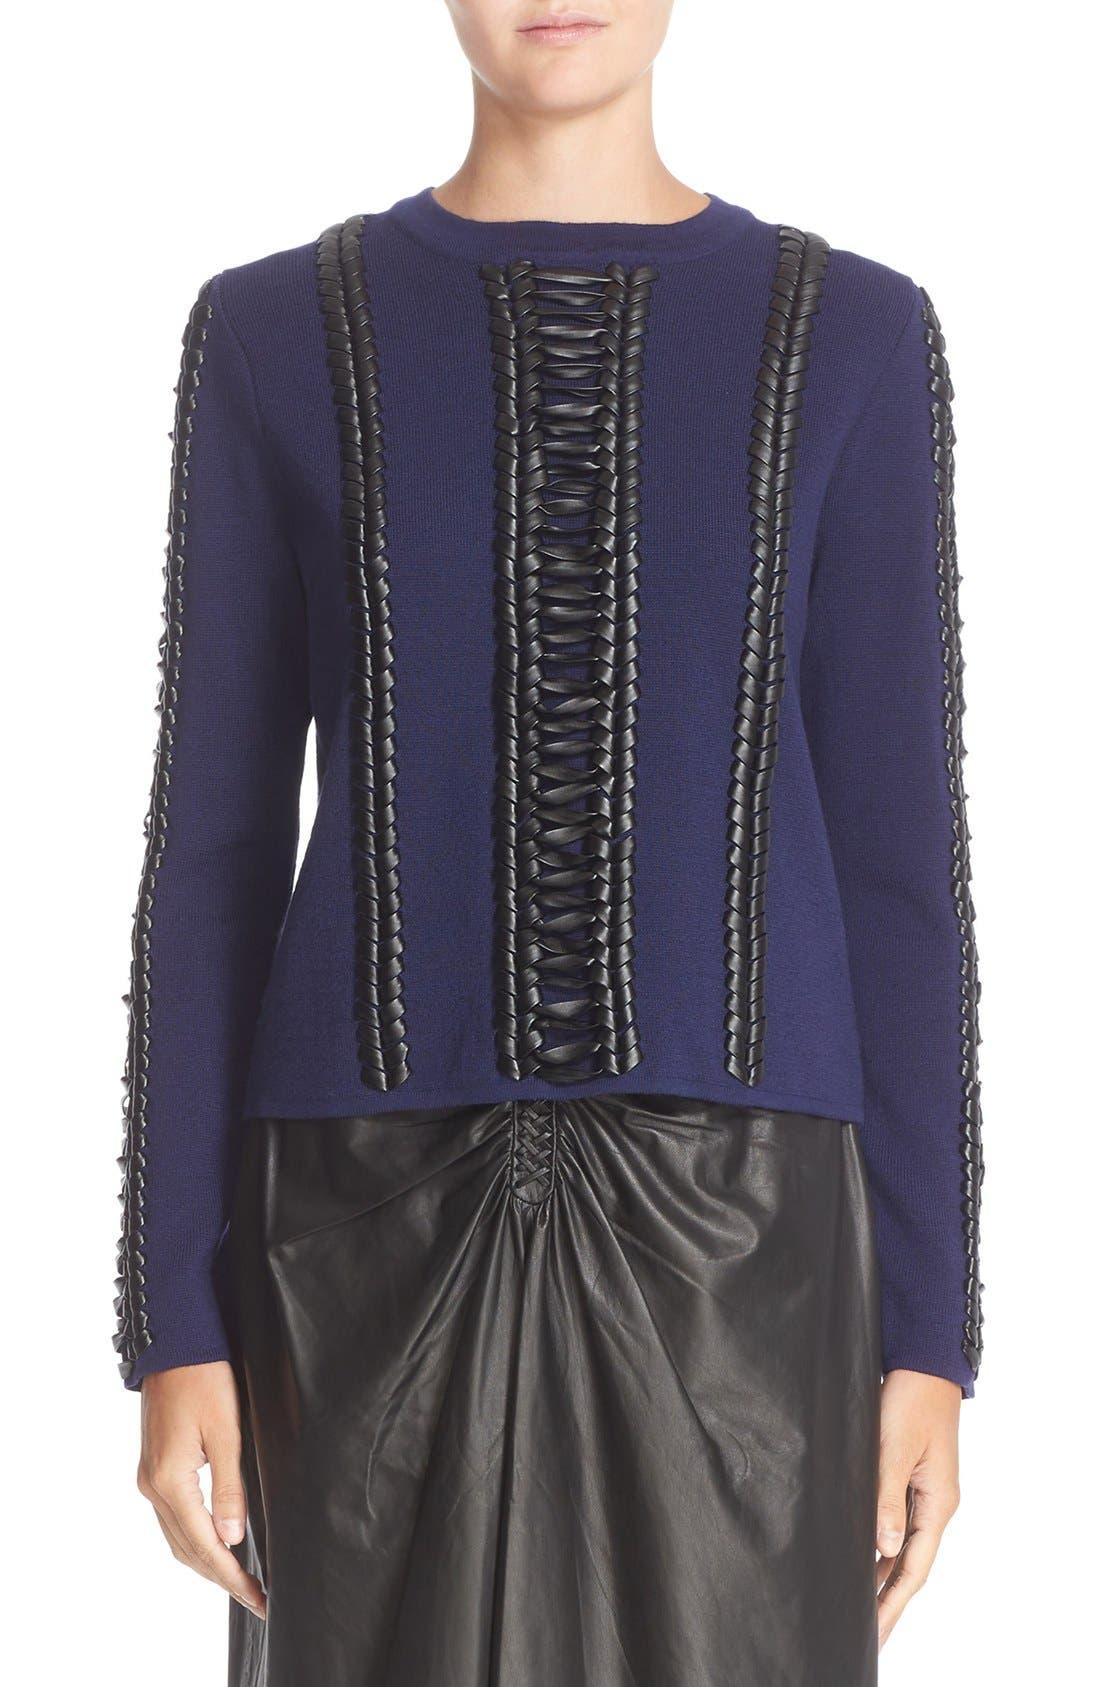 Alternate Image 1 Selected - Altuzarra Deals Lace Detail Wool Sweater